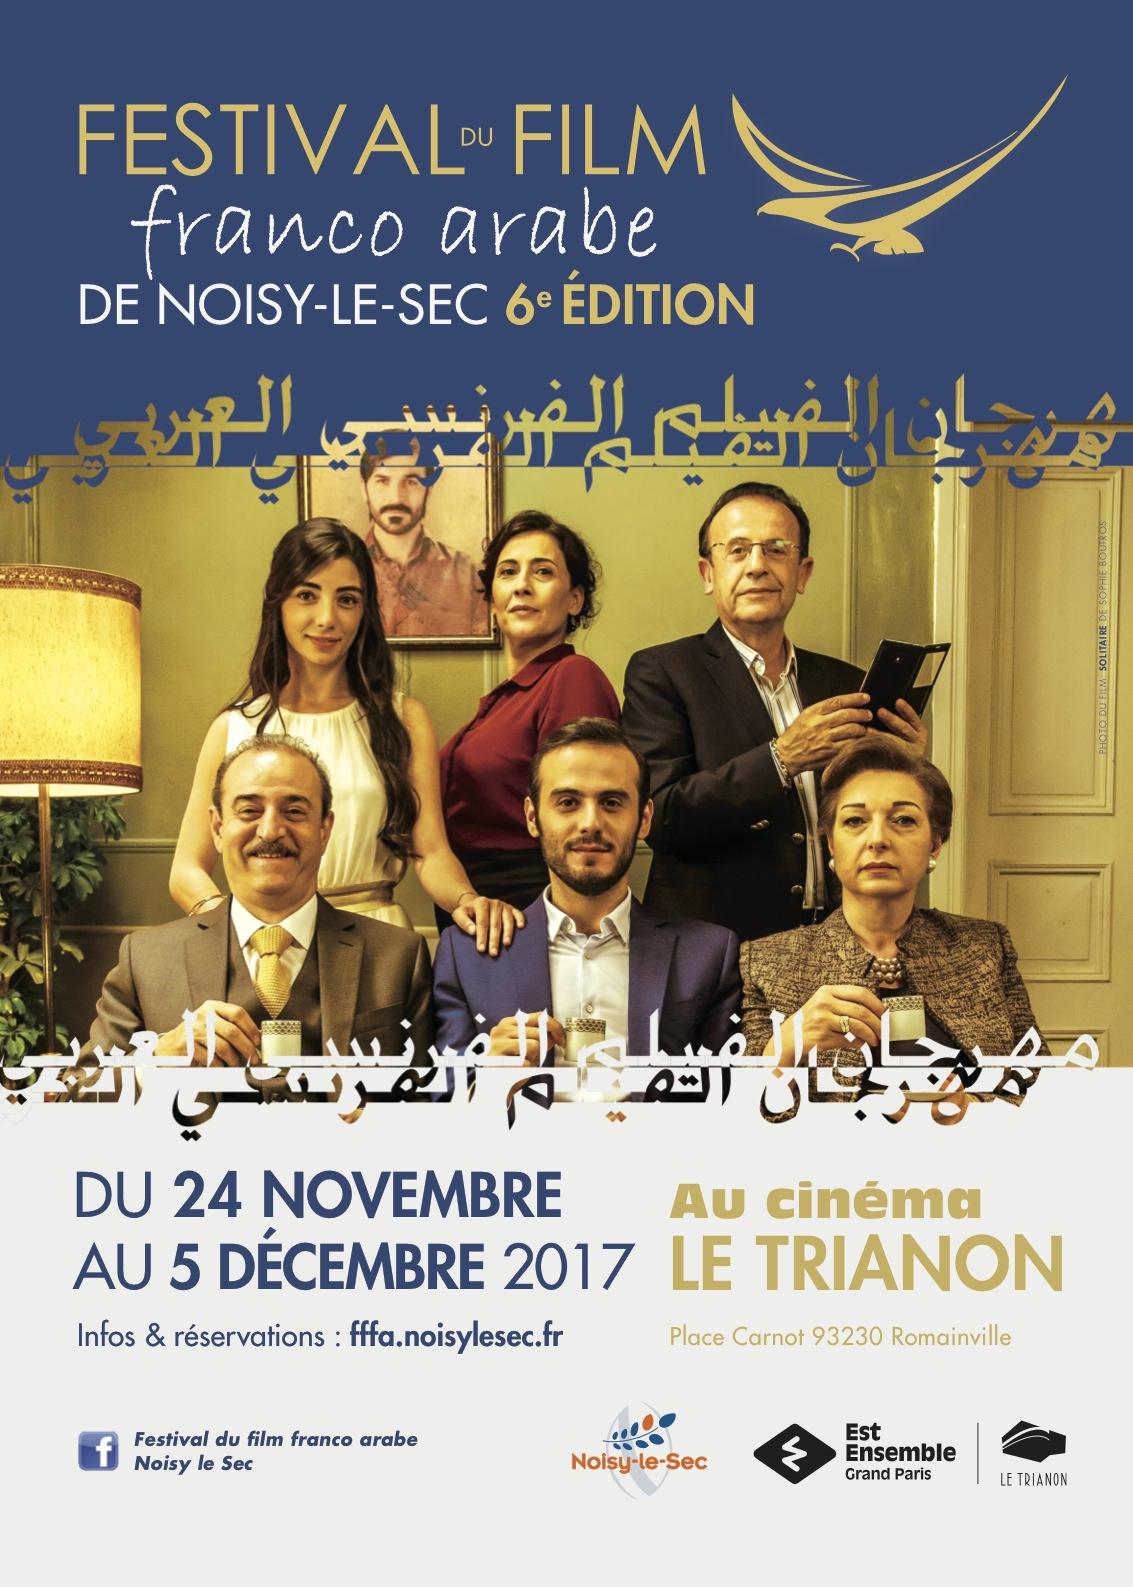 http://www.saphirnews.com/agenda/Festival-du-film-franco-arabe-de-Noisy-le-Sec_ae533188.html